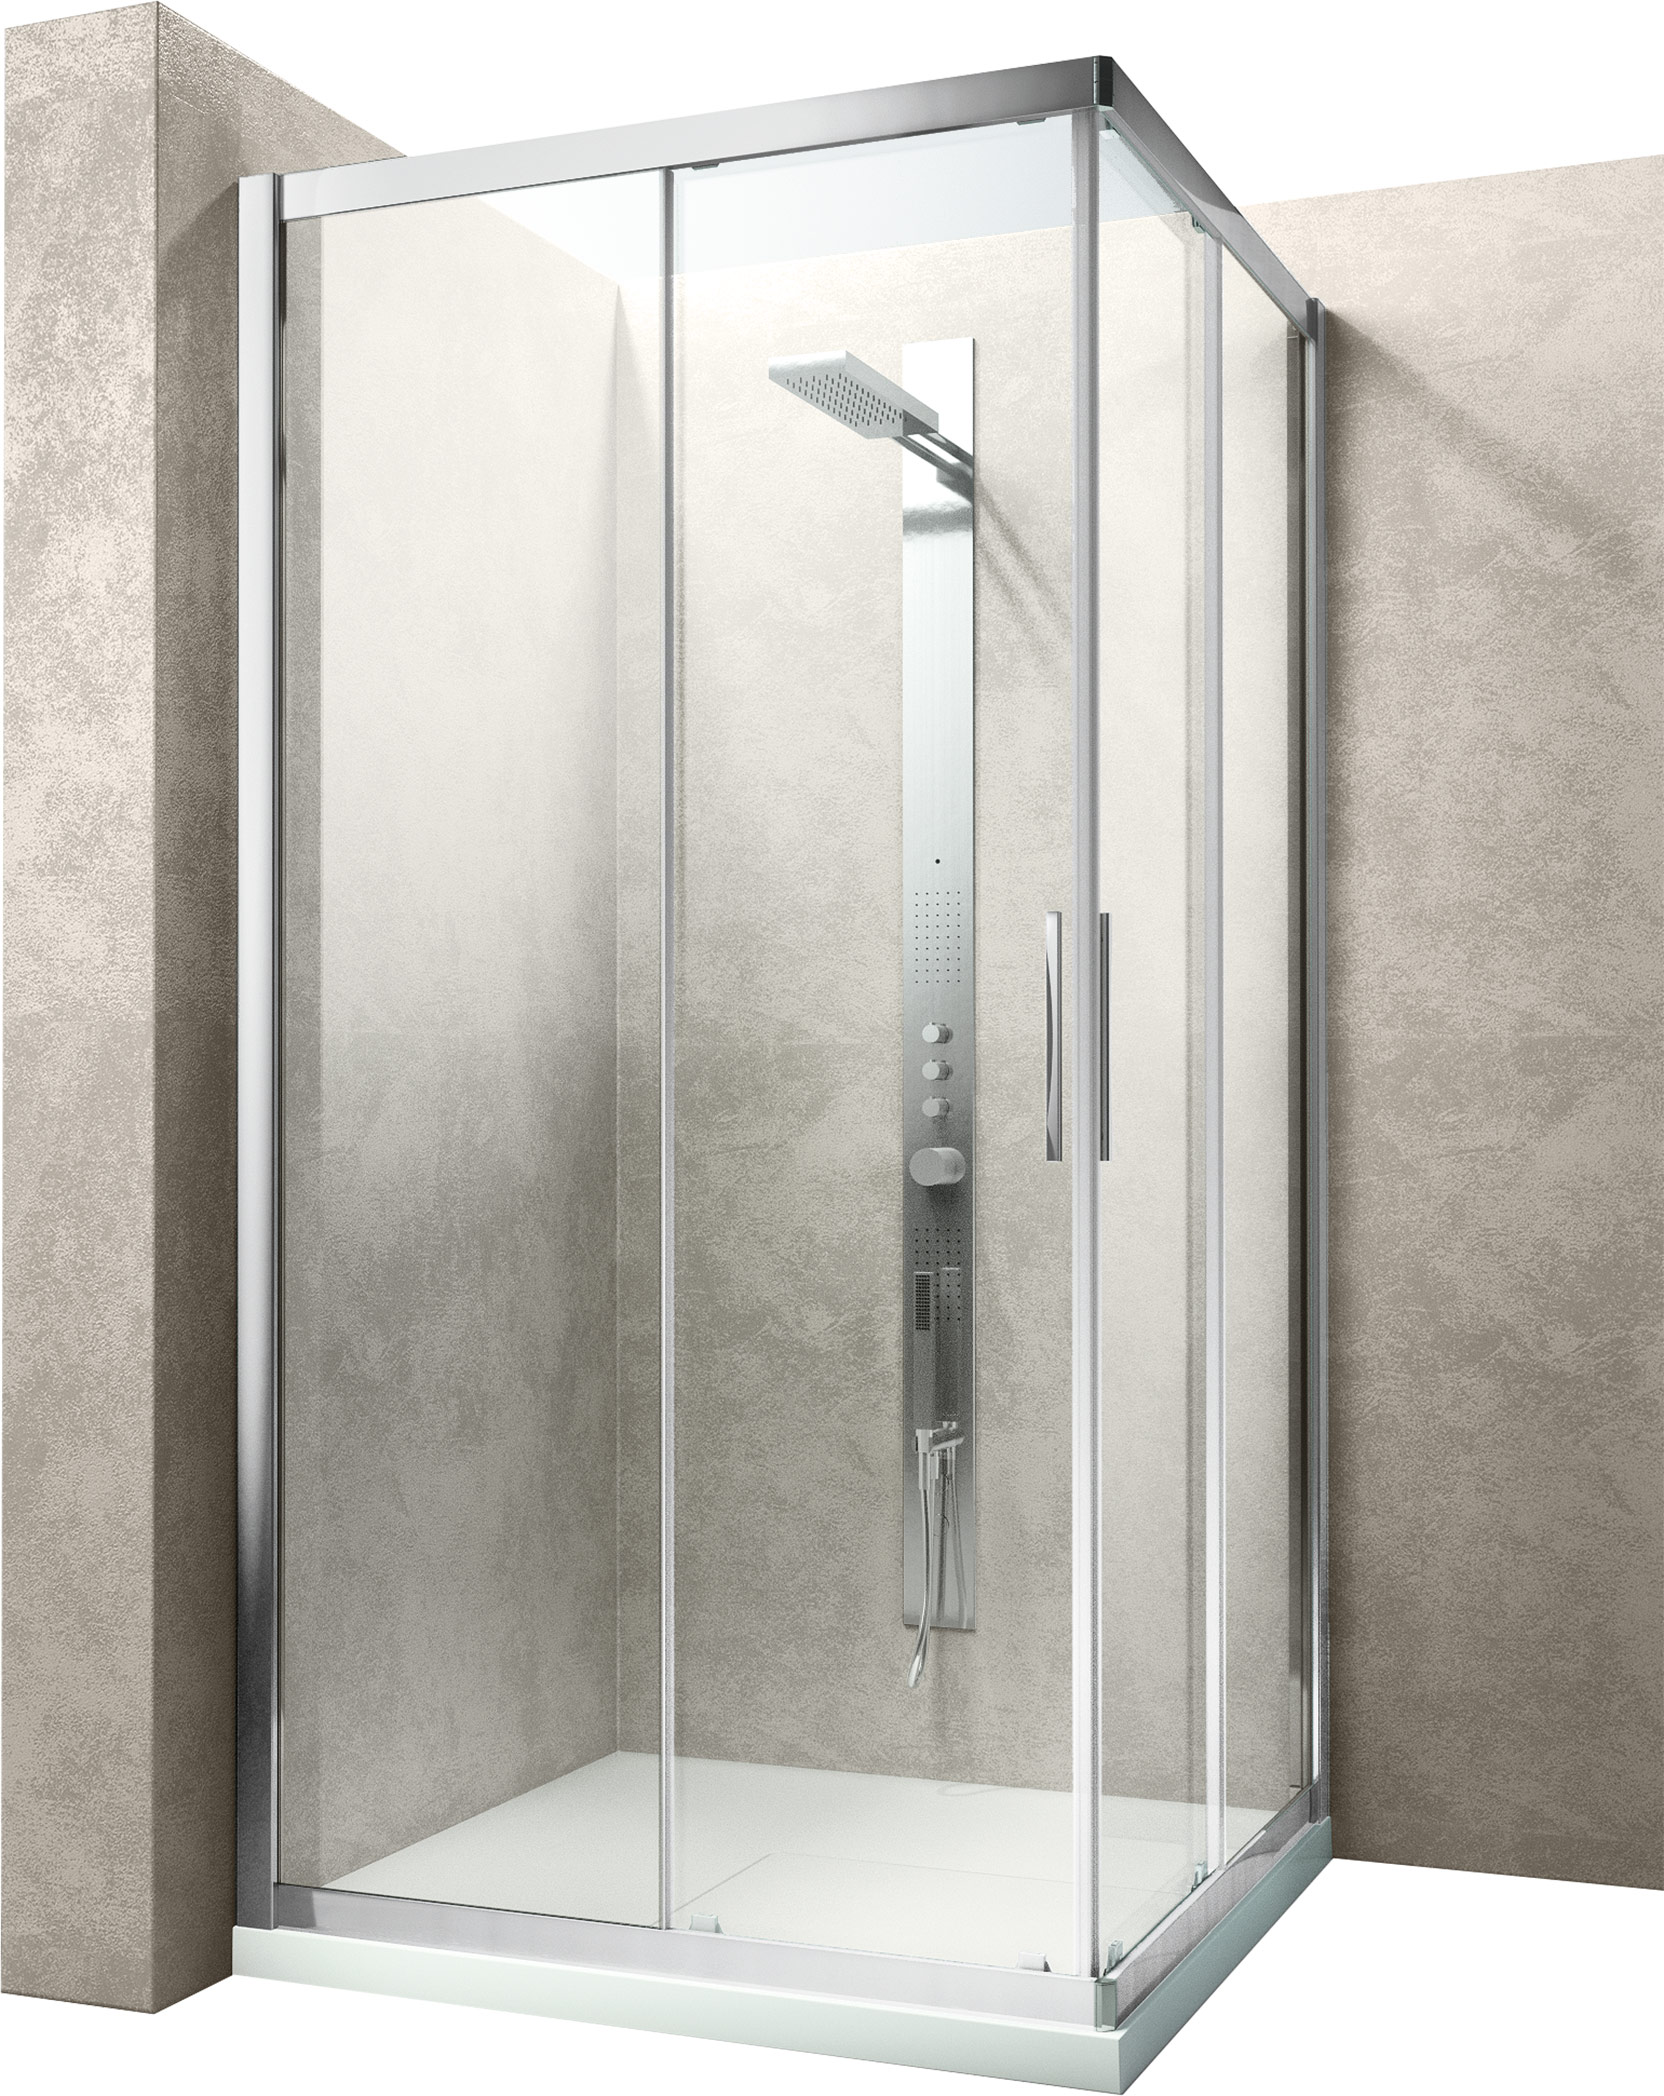 Serie 6000 | Funzionalità & estetica